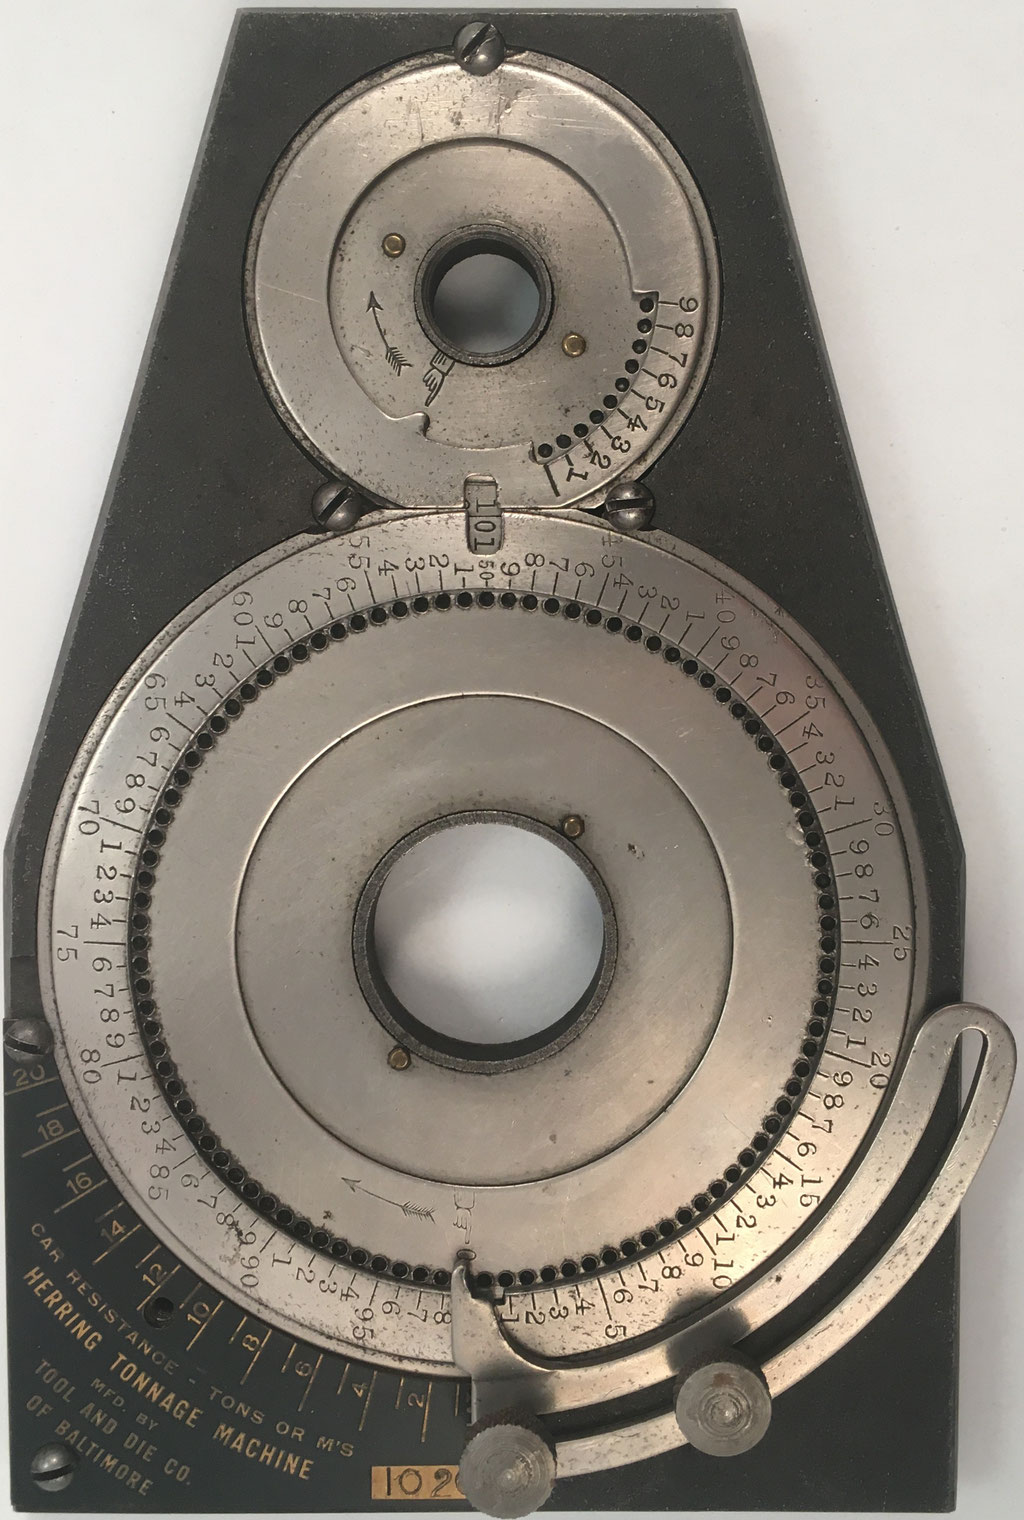 HERRING Tonnage Machine  (similar a HERRING Computing Machine y a WEBB Adder), diseñado por John L. Herring en Derry (USA), s/n 1026. Fue fabricado por TOOL & DIE Co. en Baltimore (USA), año 1916, 18.5x12 cm